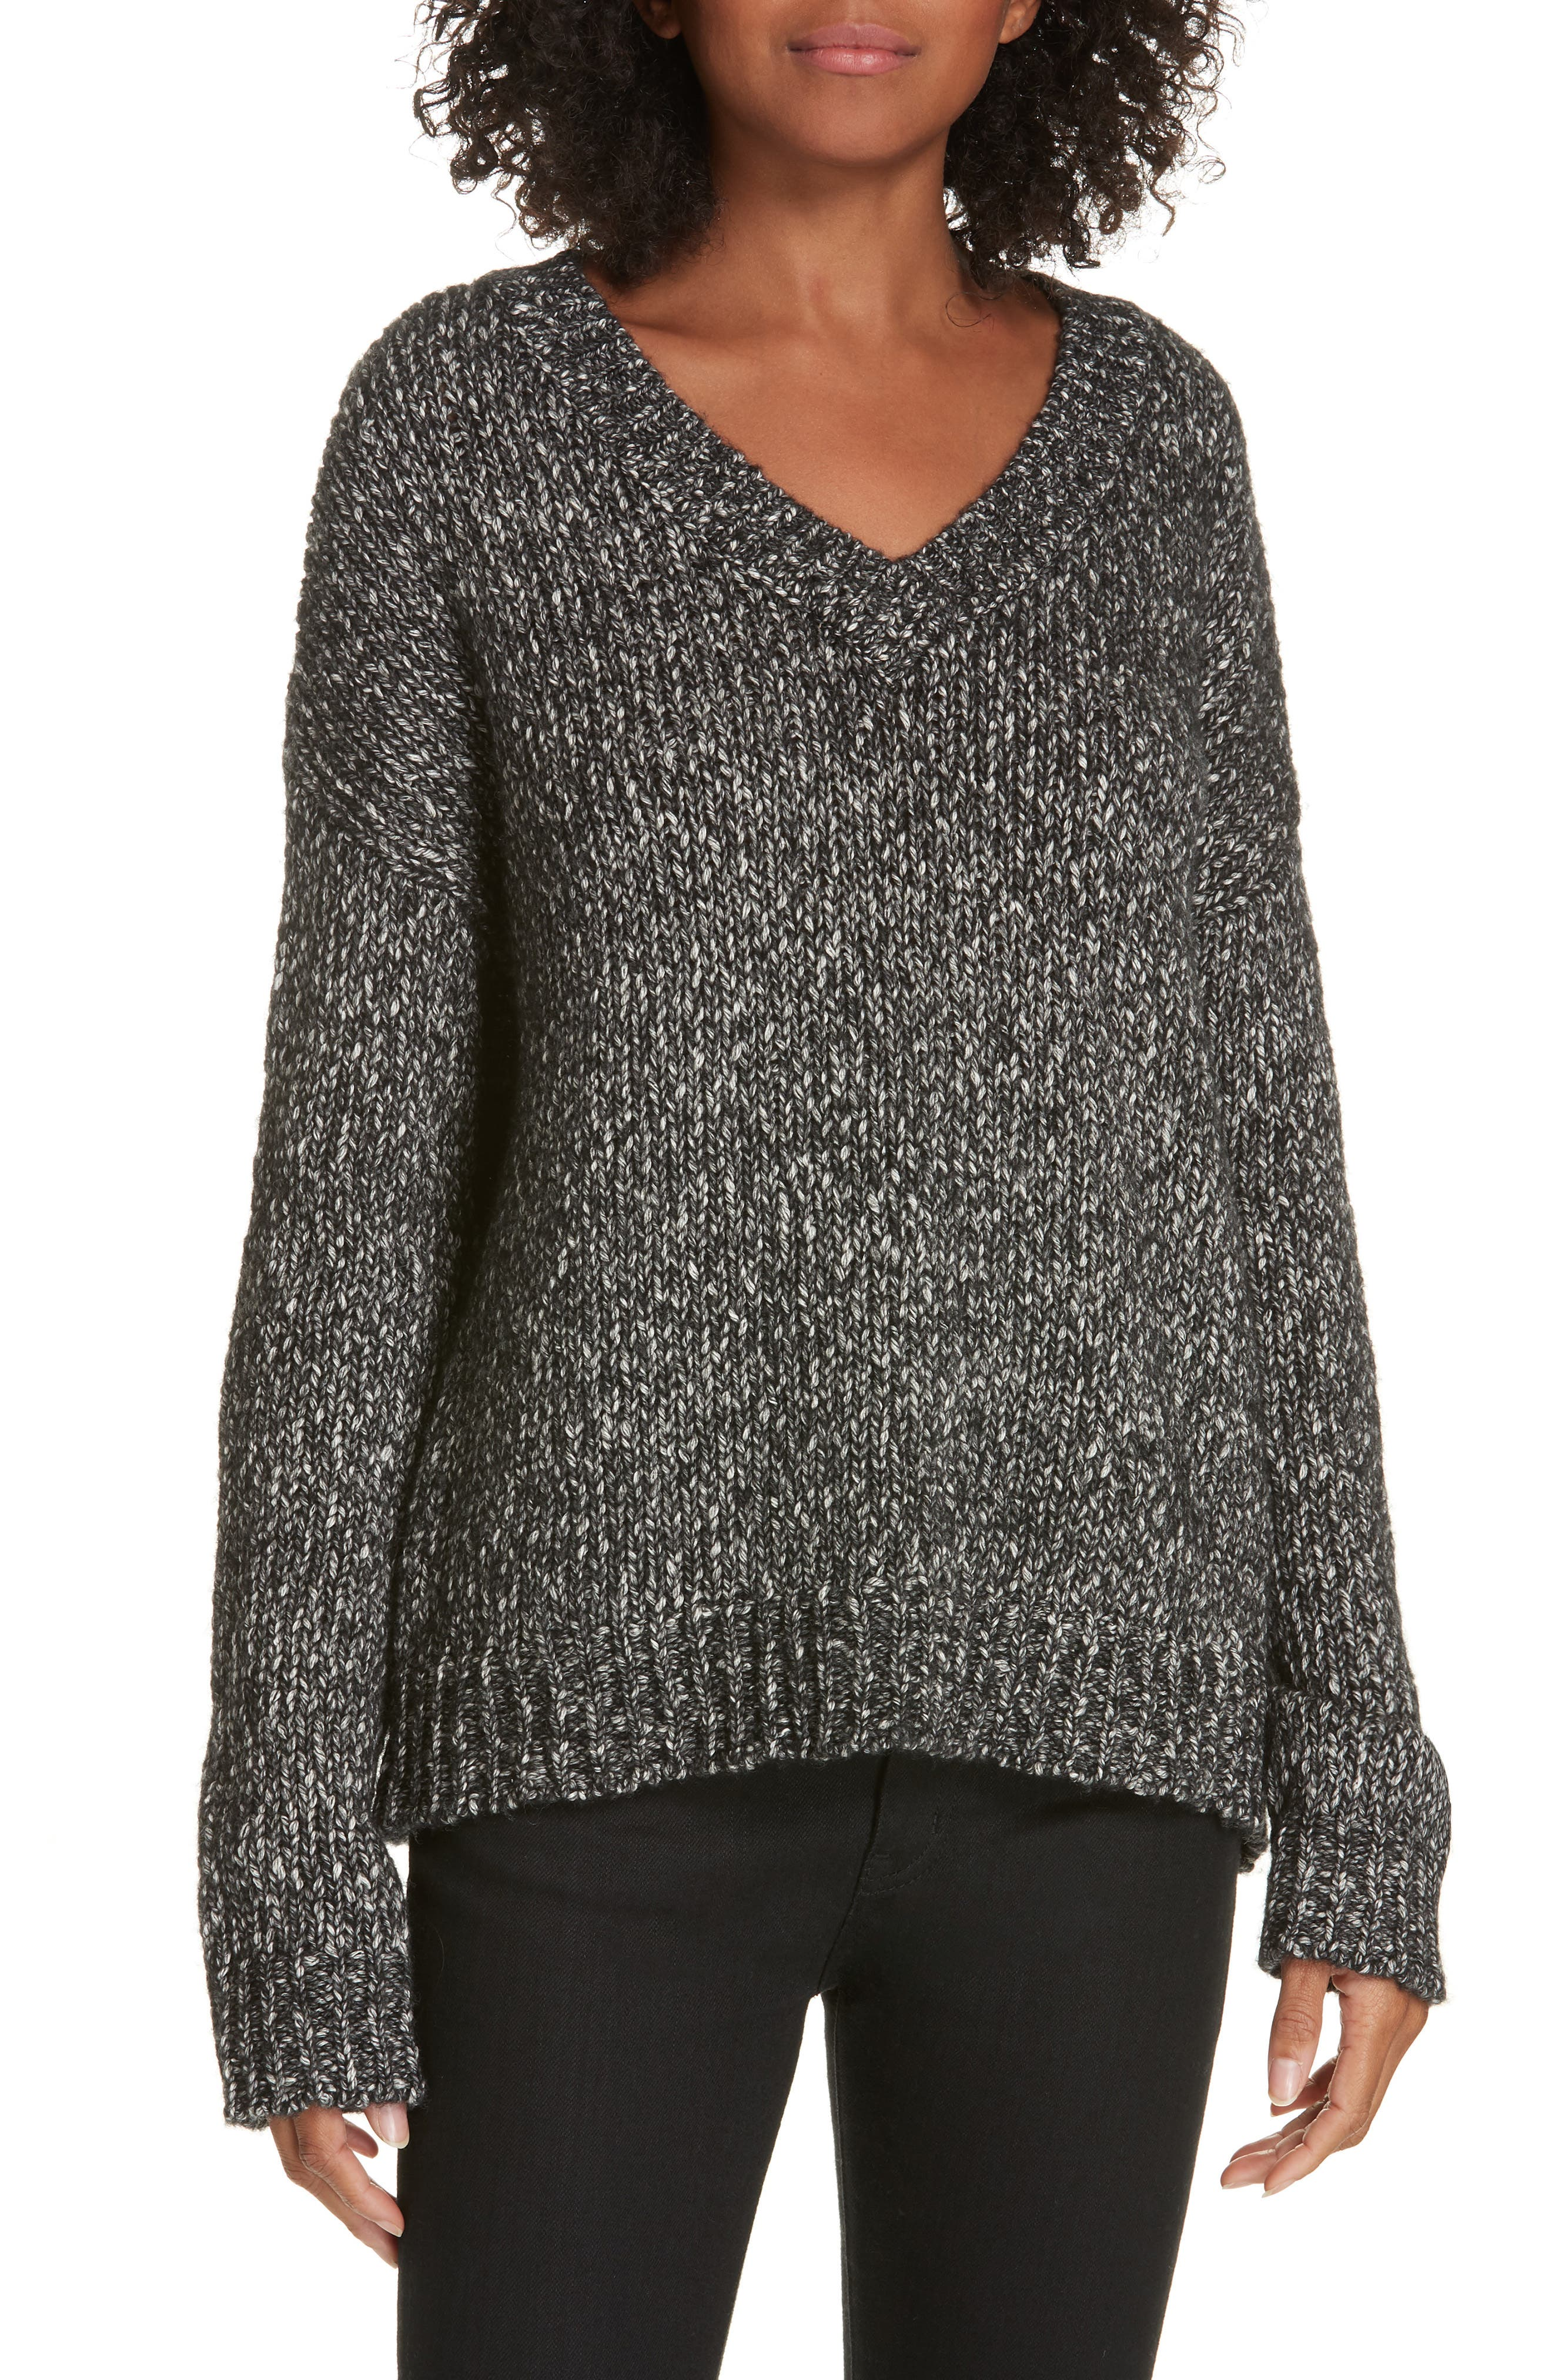 Parkland Slouchy Cotton & Wool Sweater,                         Main,                         color, LEAD MELANGE